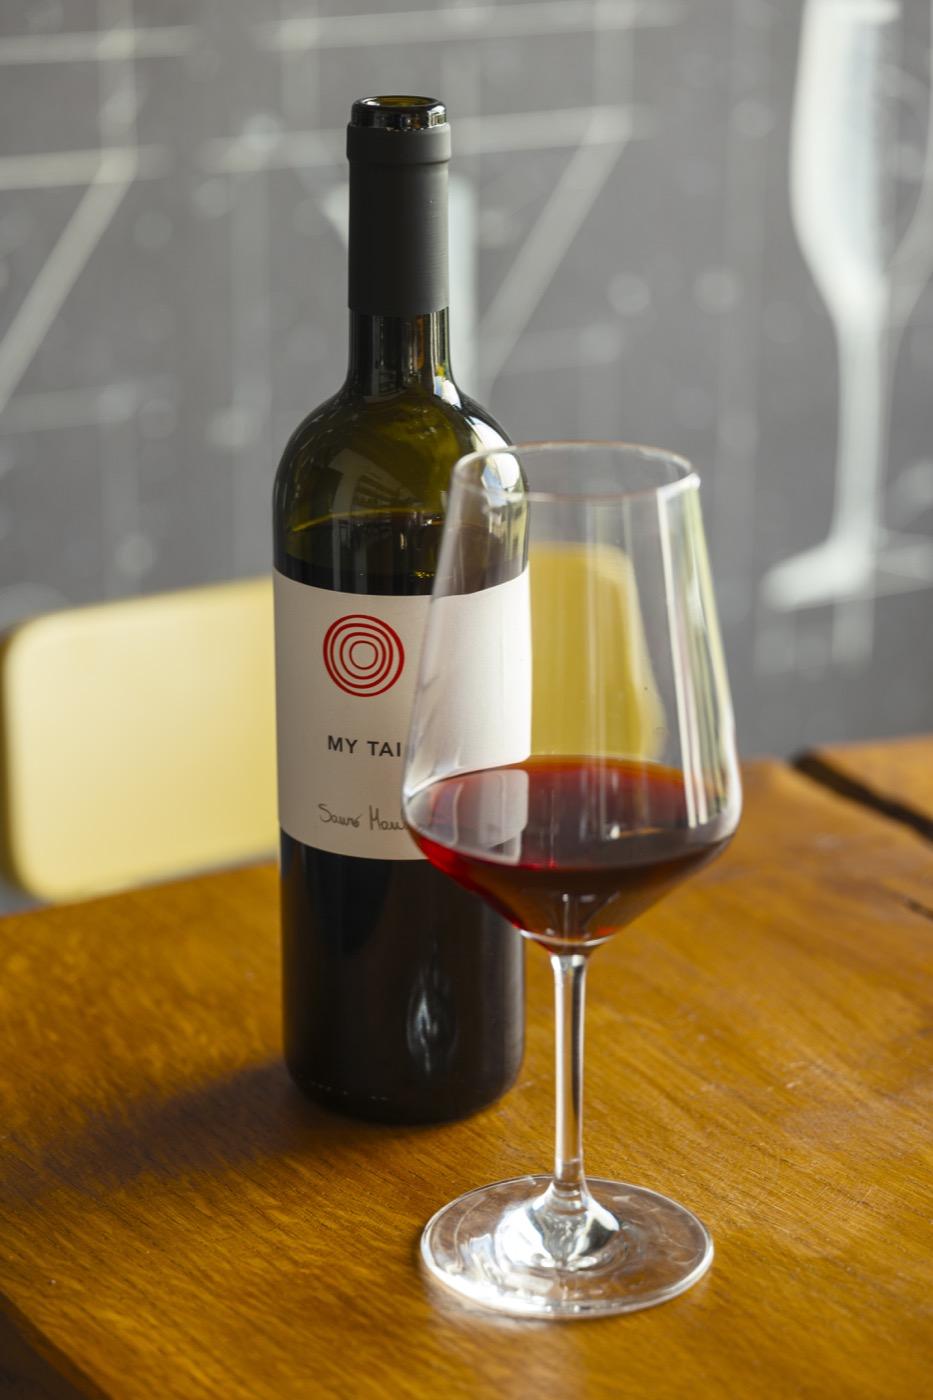 Sauro-Maule-Vigne-cantina-vini-L1160076_p_lr_1400